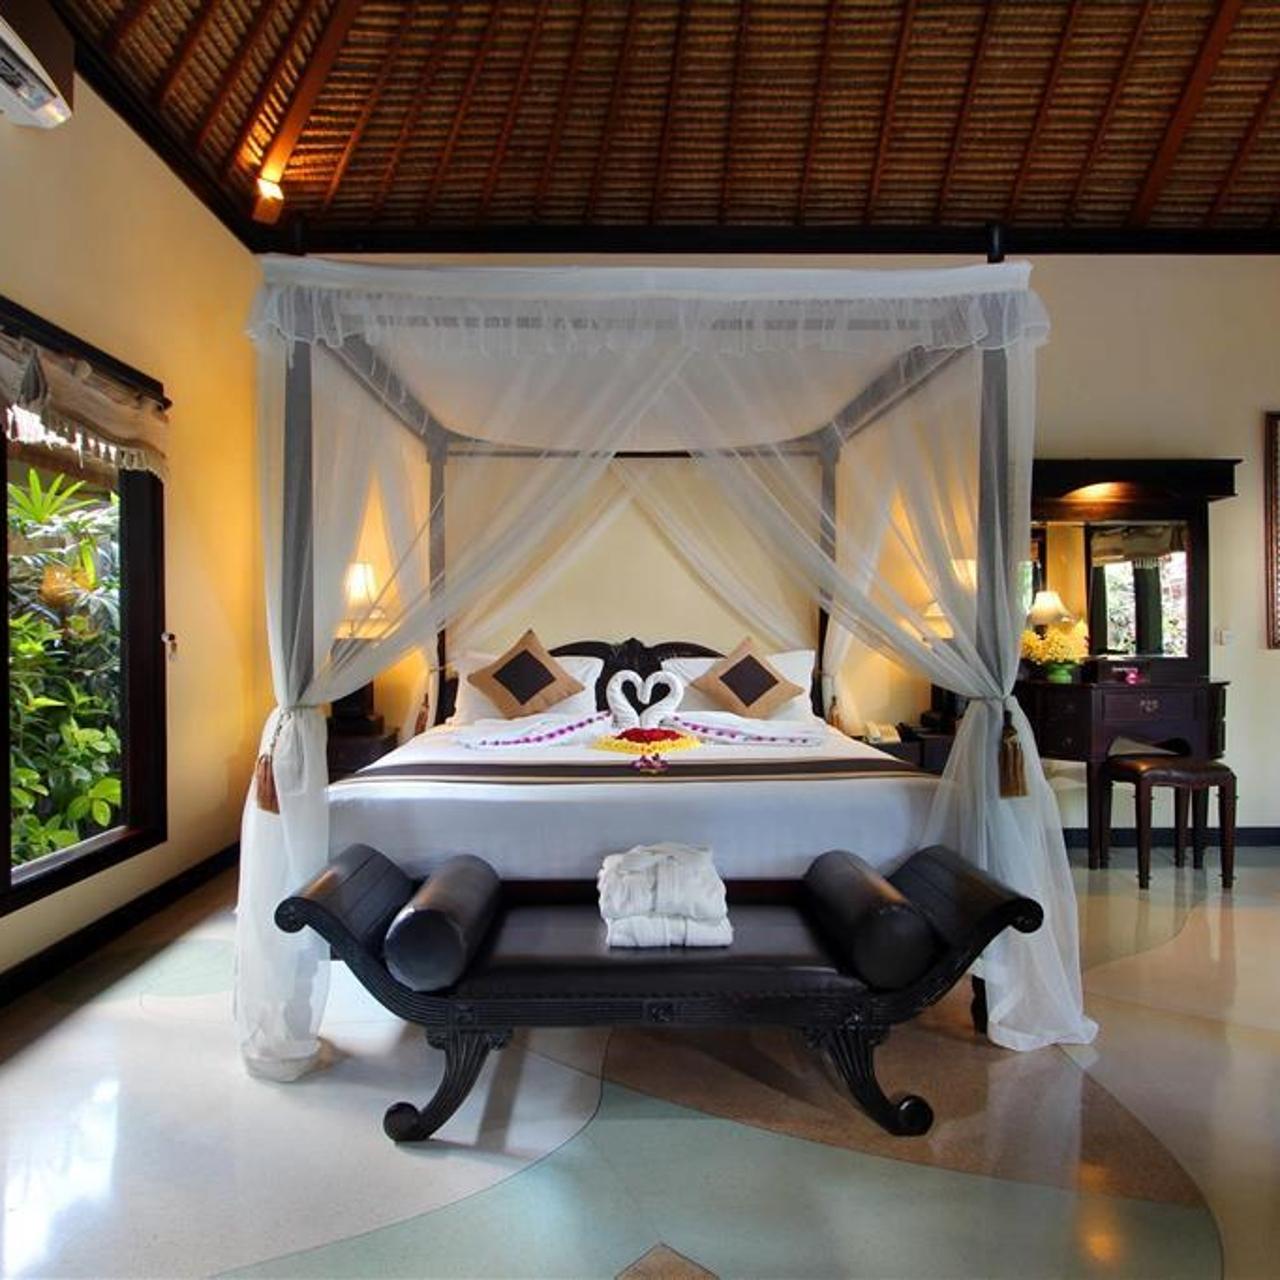 Hotel Furama Villas Spa Ubud 5 Hrs Star Hotel In Ubud Bali